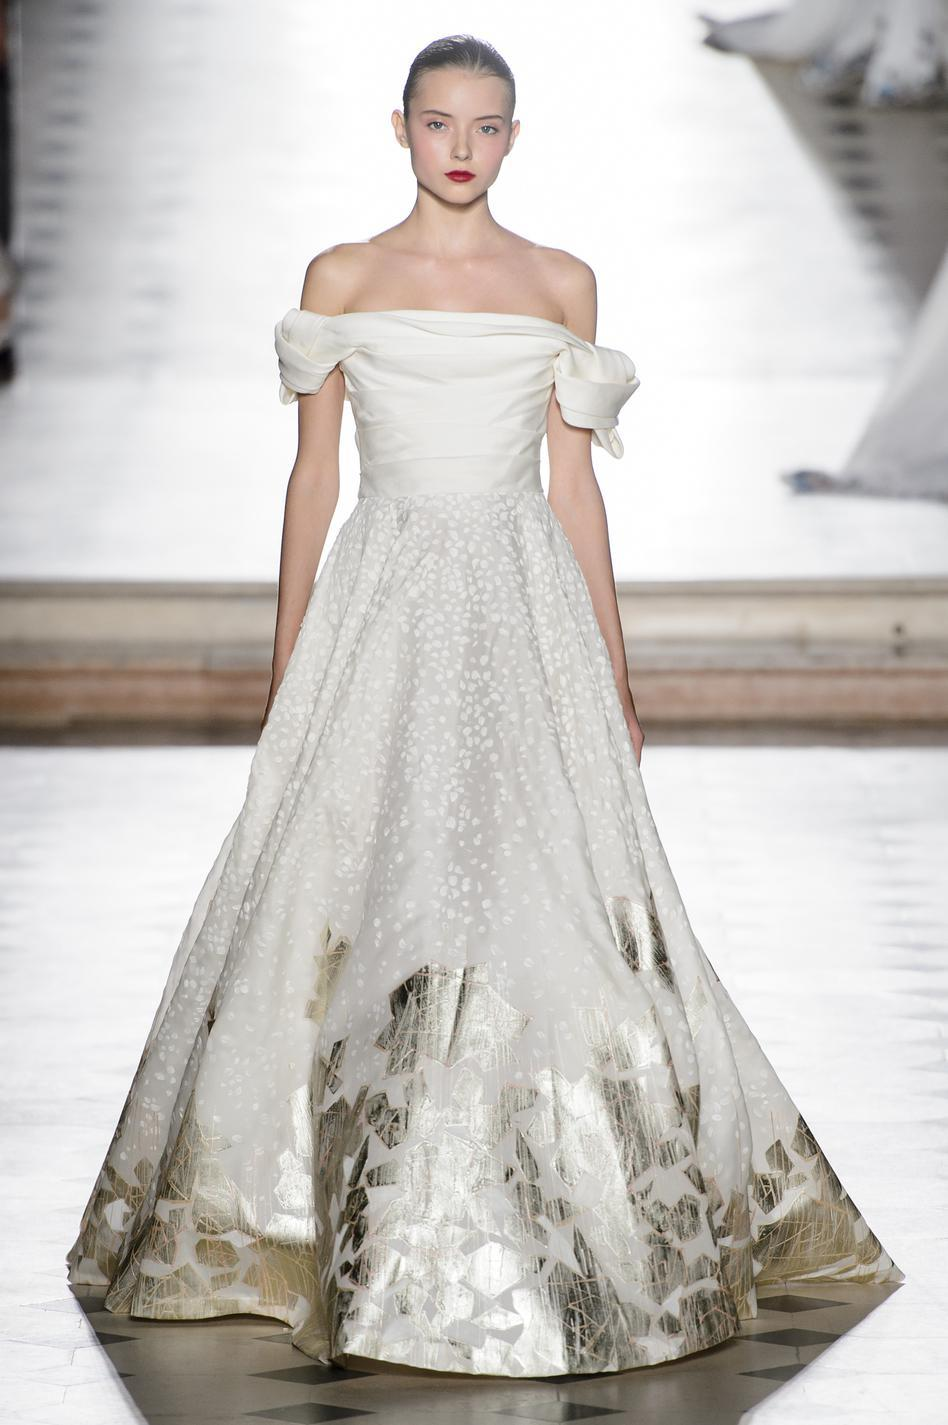 f850c1431b4031 Chanel, Dior, Schiaparelli... les plus belles robes de mariée ...